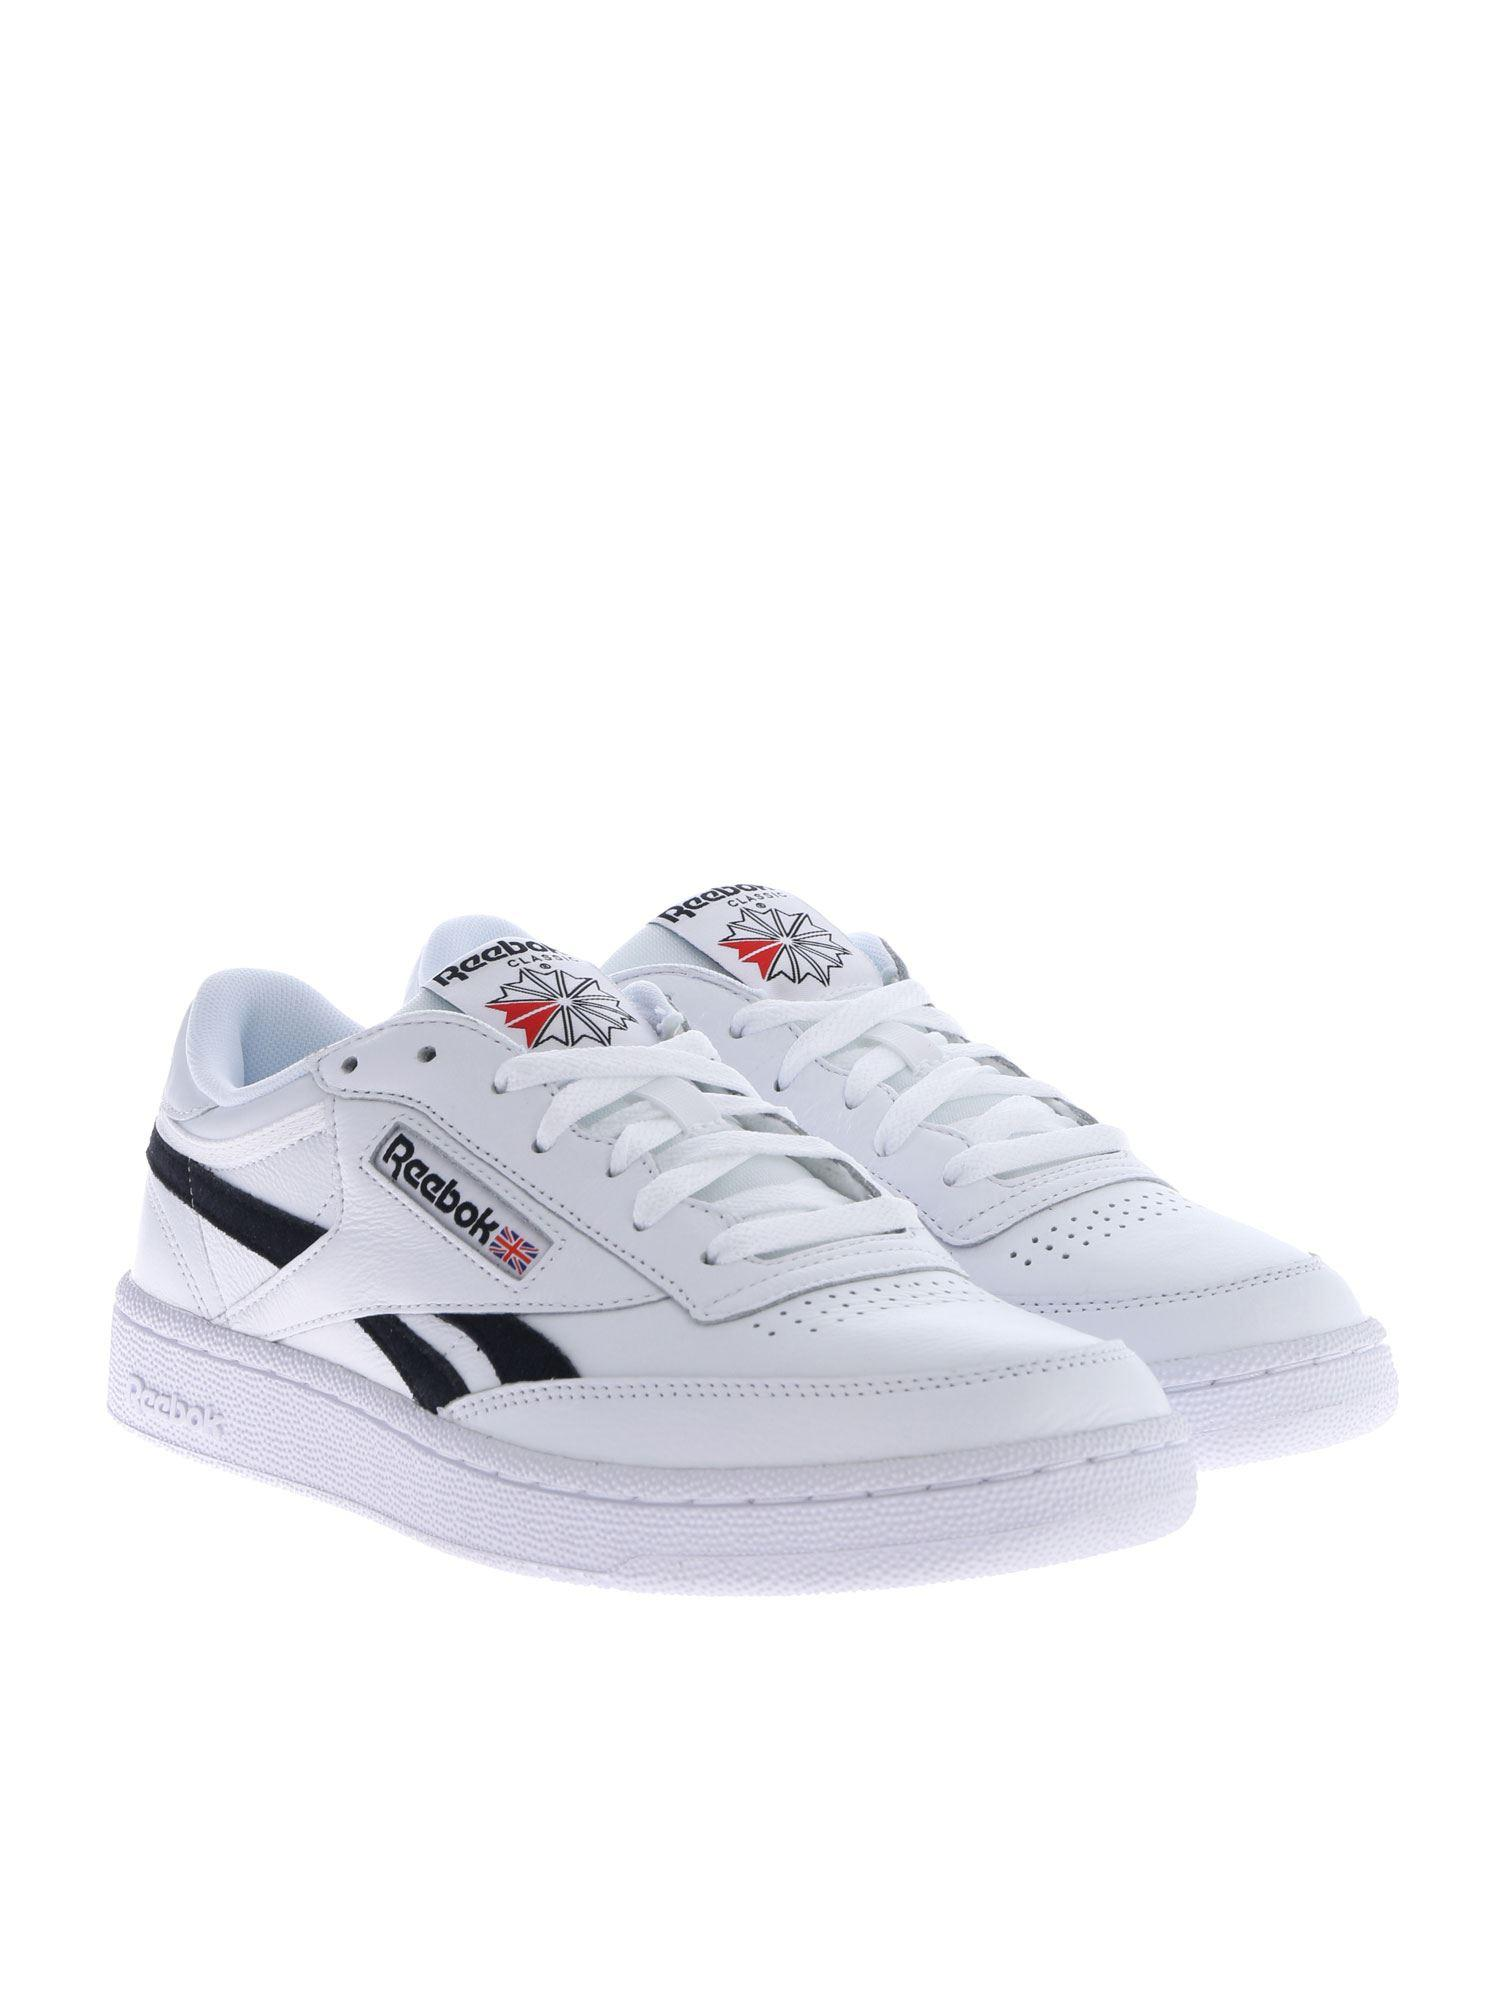 ffc70e318e Lyst - Reebok Revenge Plus Mu Sneakers In White And Black in White for Men